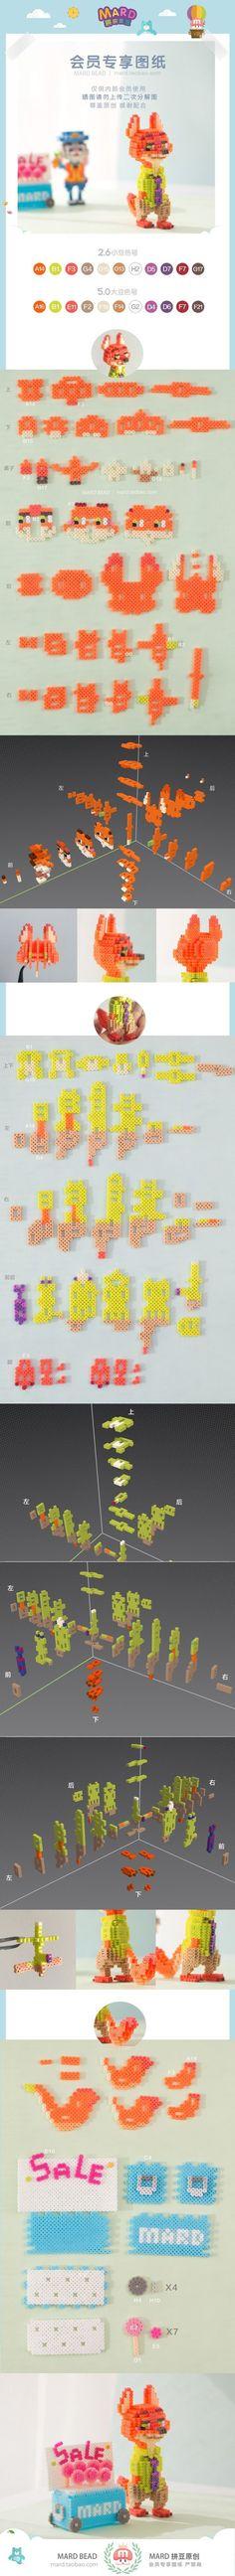 Easy Perler Bead Patterns, Fuse Bead Patterns, Perler Bead Templates, Beading Patterns, Perler Bead Disney, 3d Perler Bead, Hamma Beads 3d, Fuse Beads, Hama Beads Kawaii